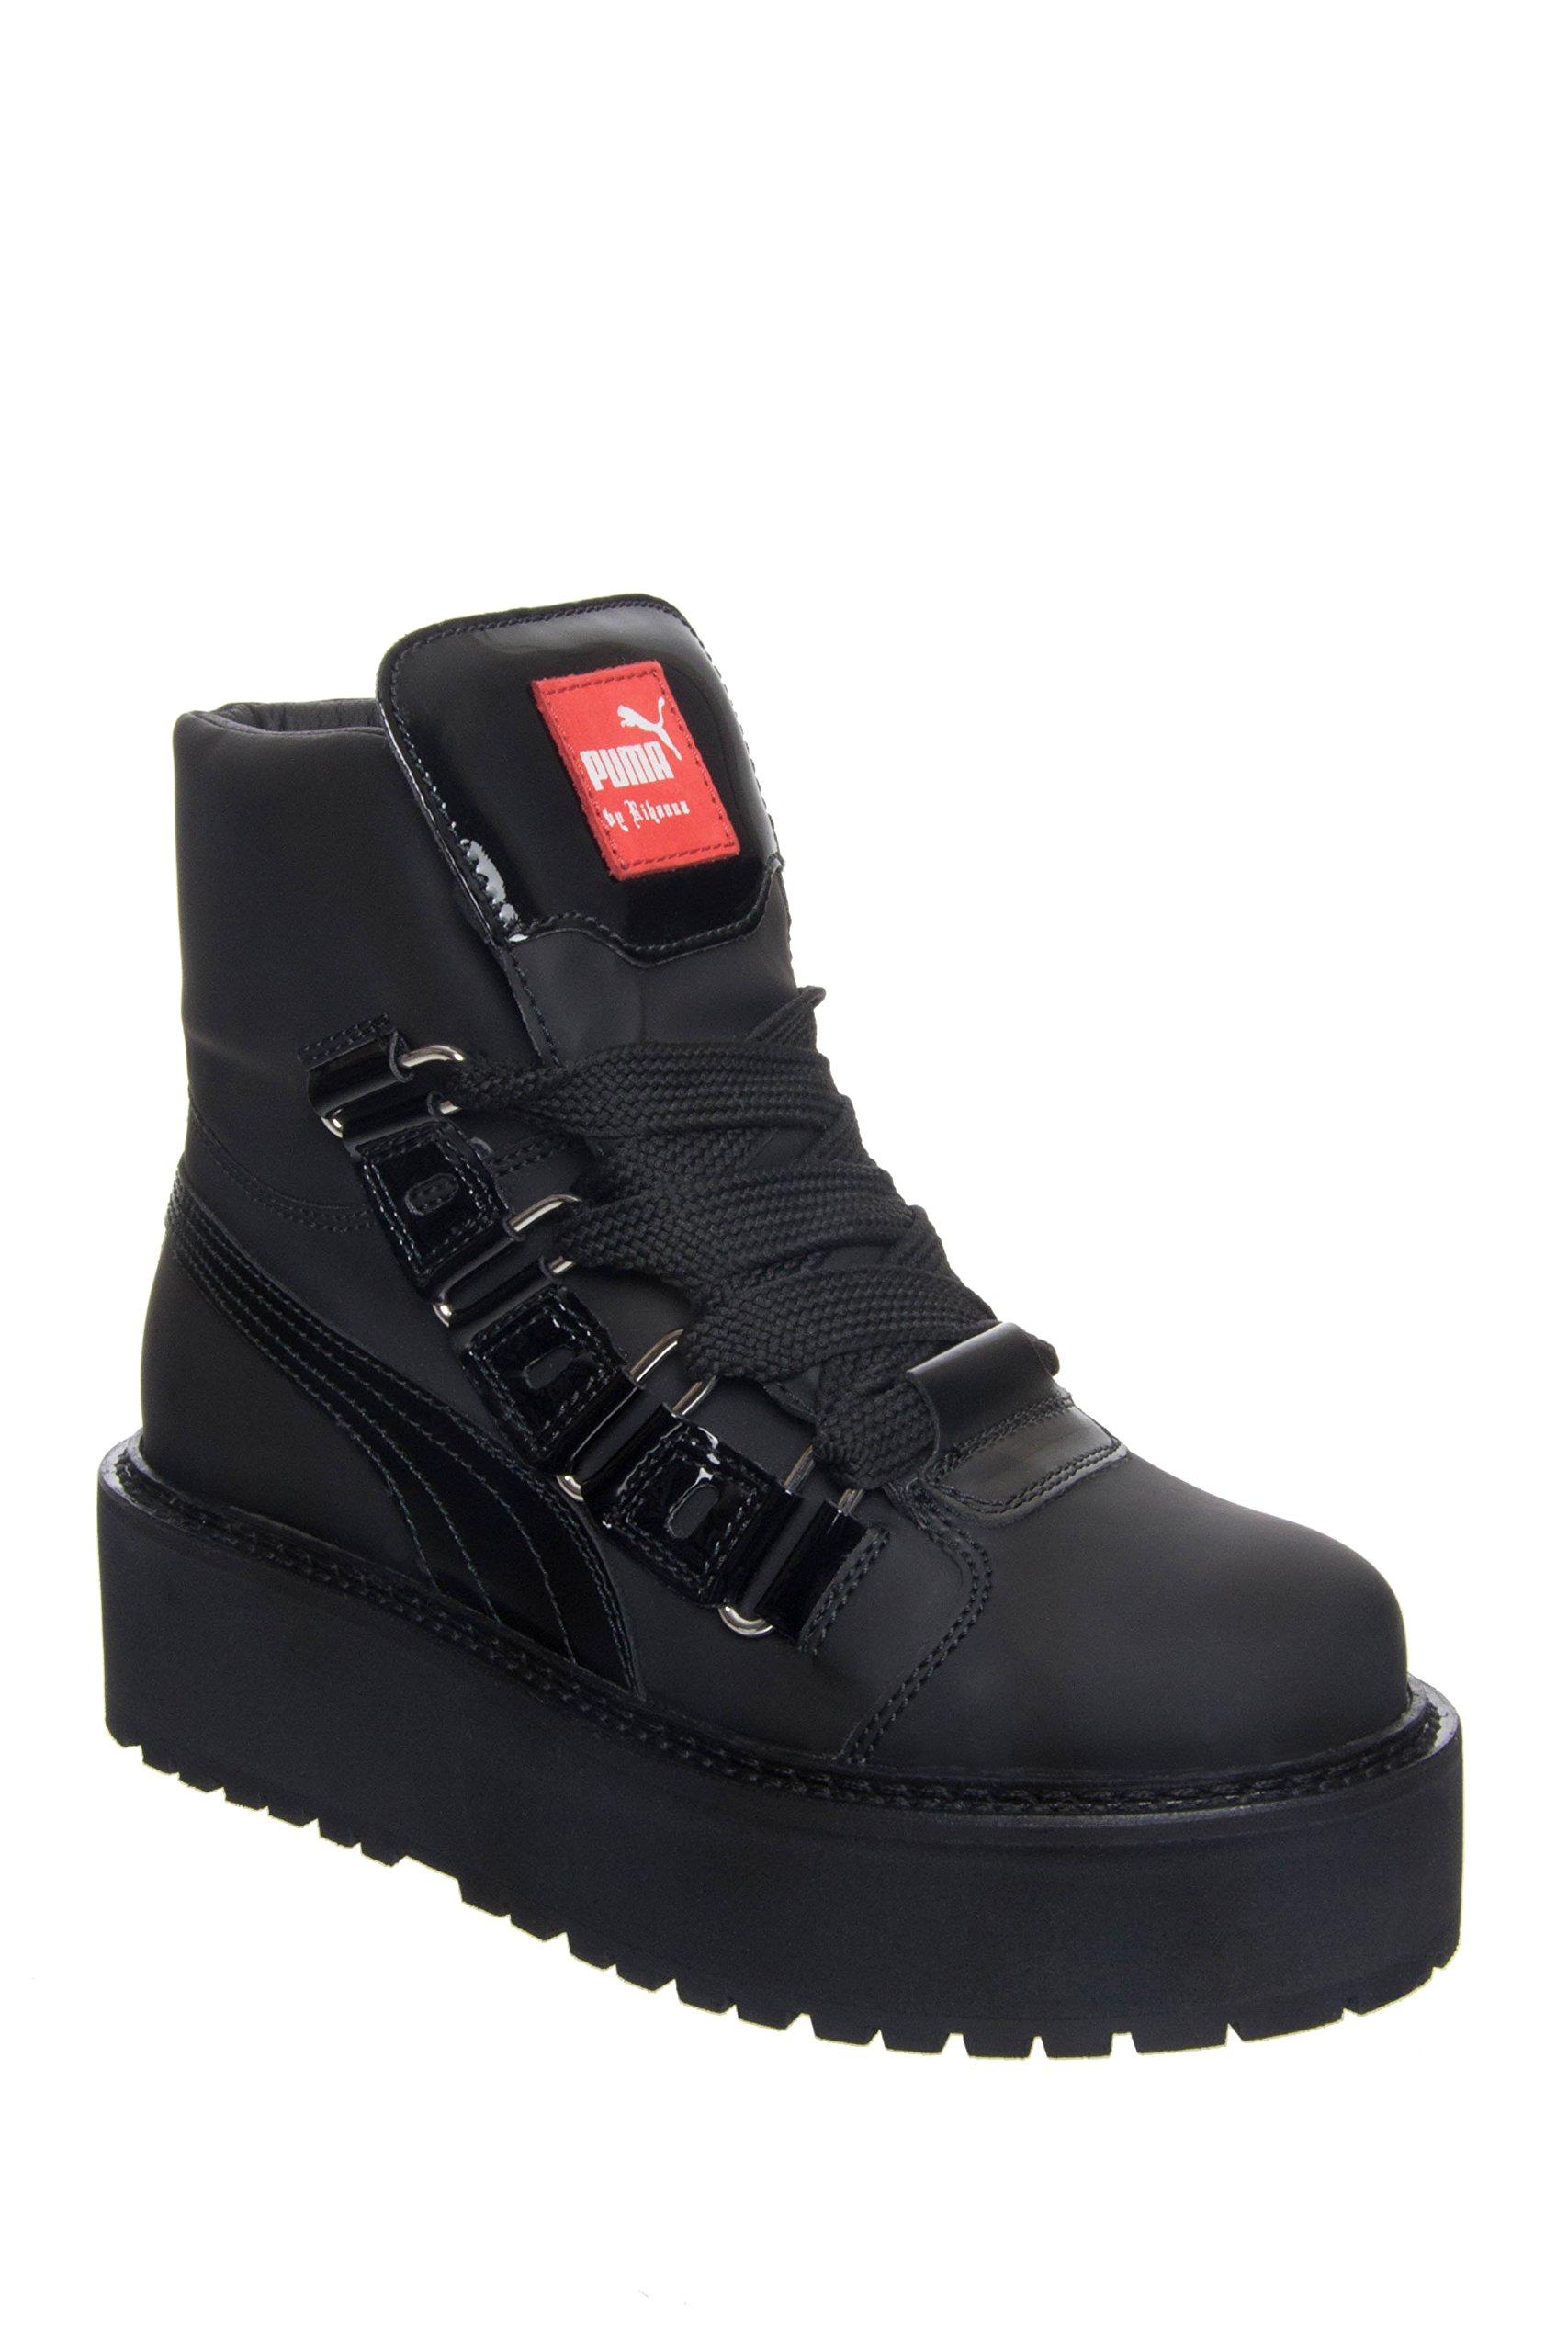 Puma x Fenty By Rihanna Men SB Boot Eyelets (black)